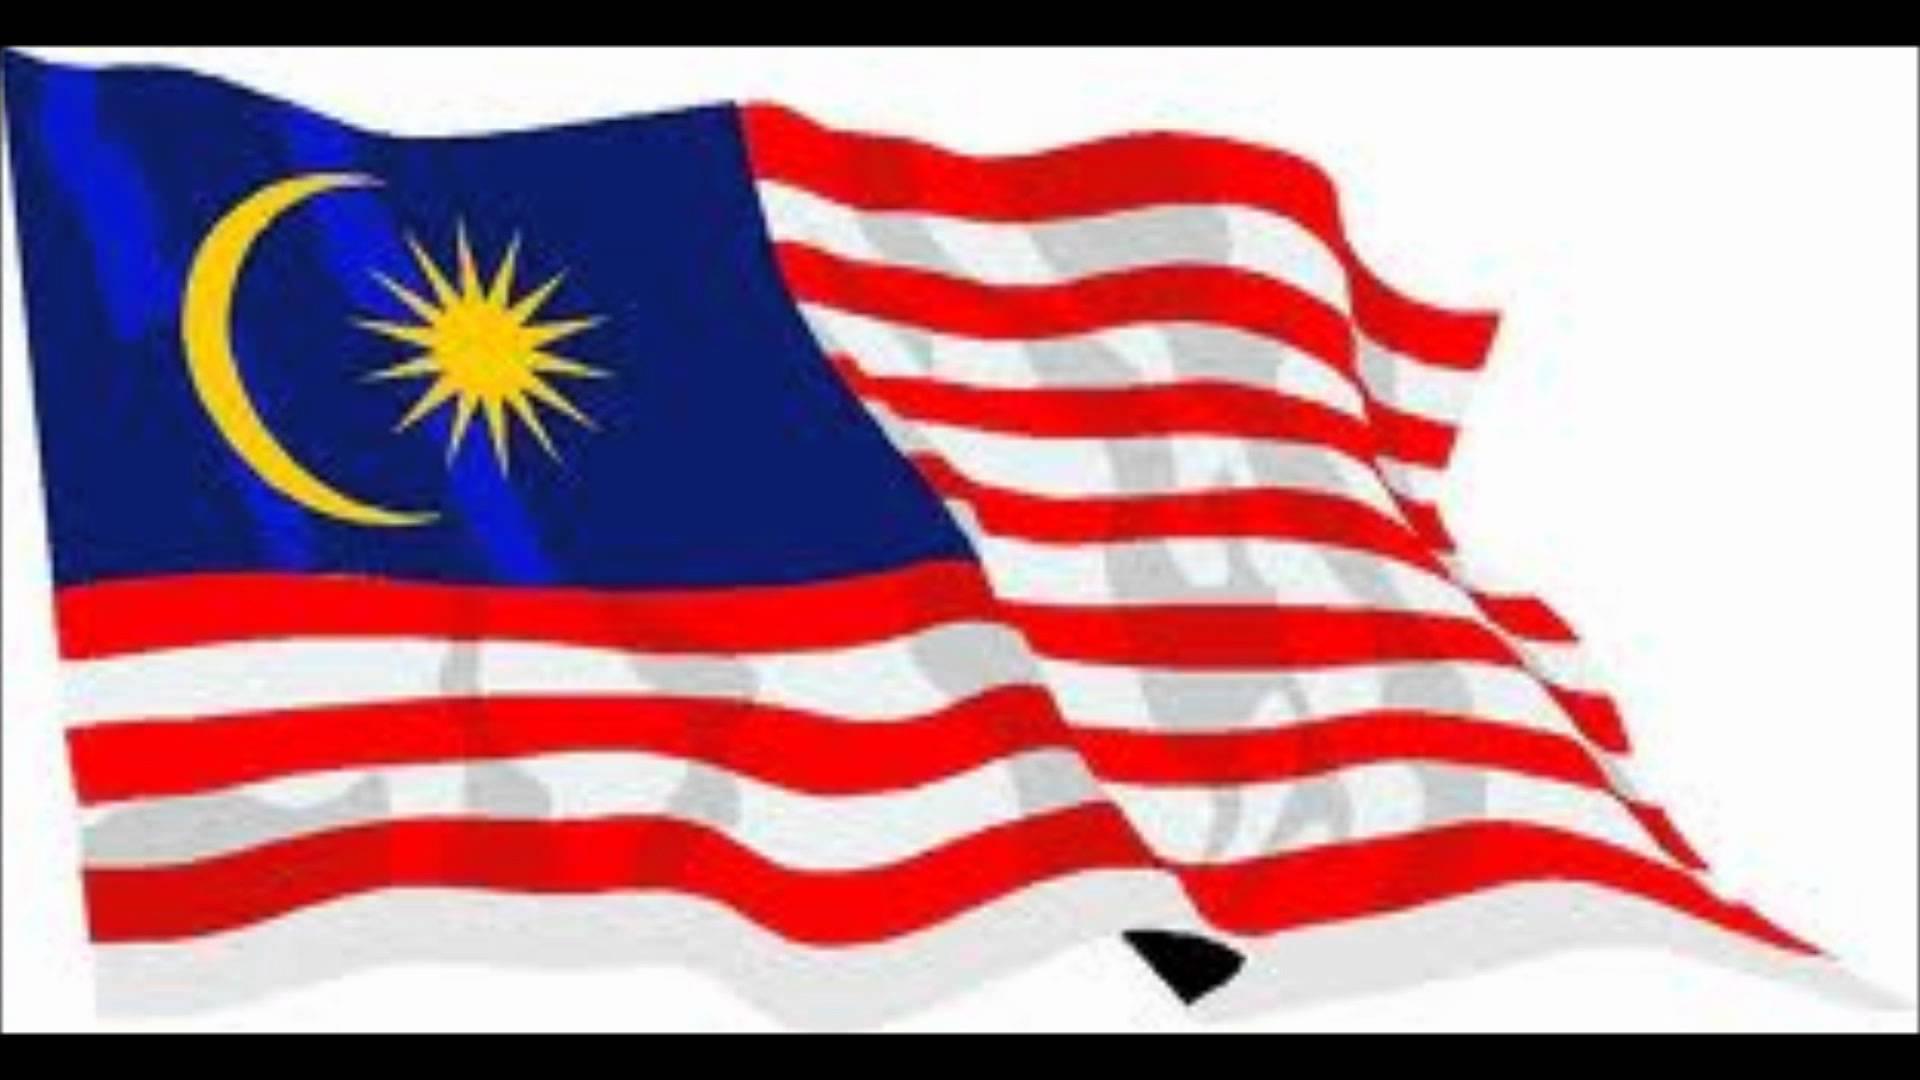 Malaysia clipart jalur gemilang Maxresdefault Jalur Images Search jpg